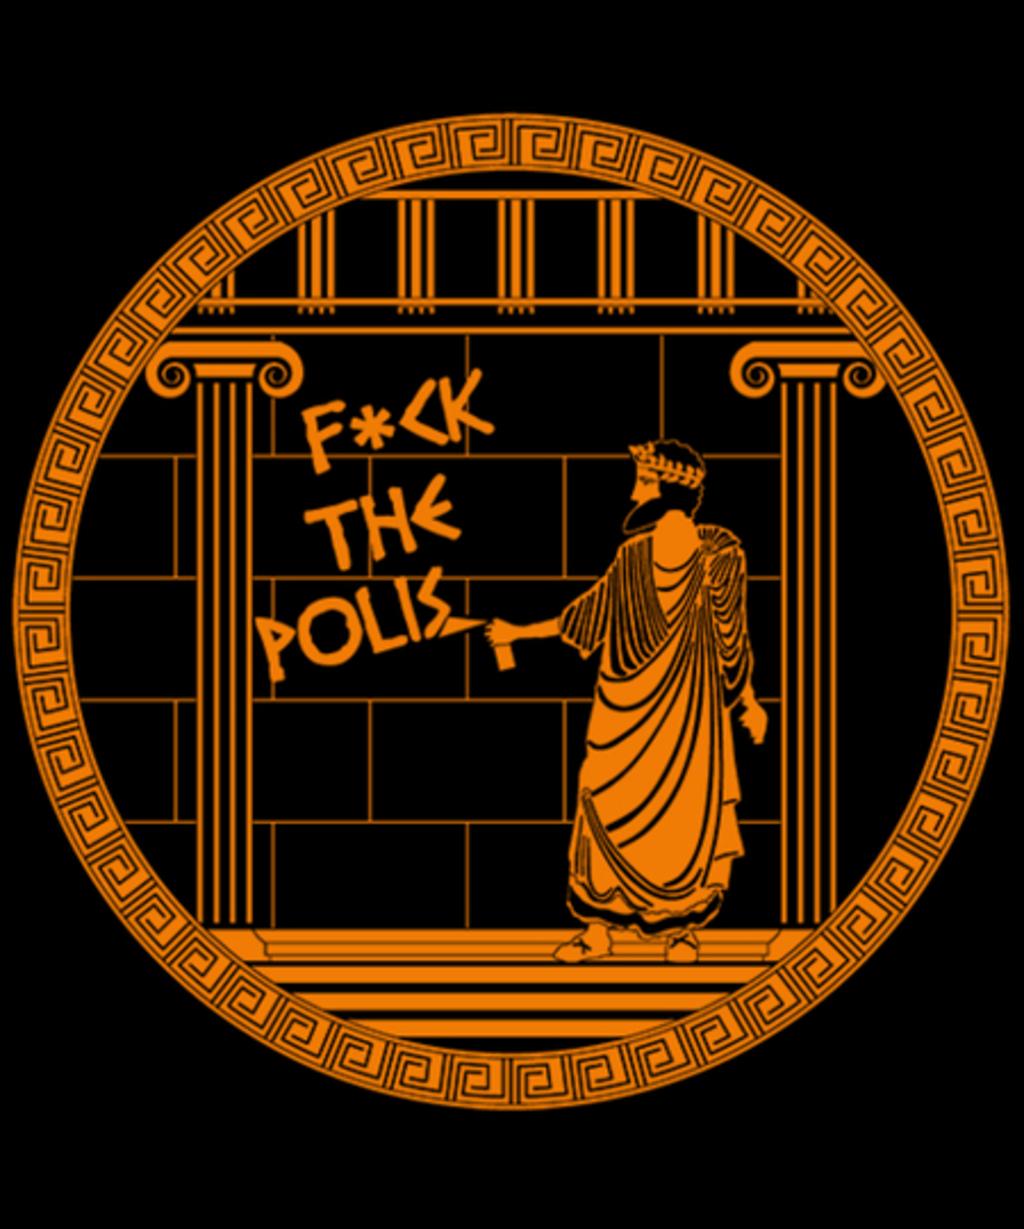 Qwertee: F*ck the polis